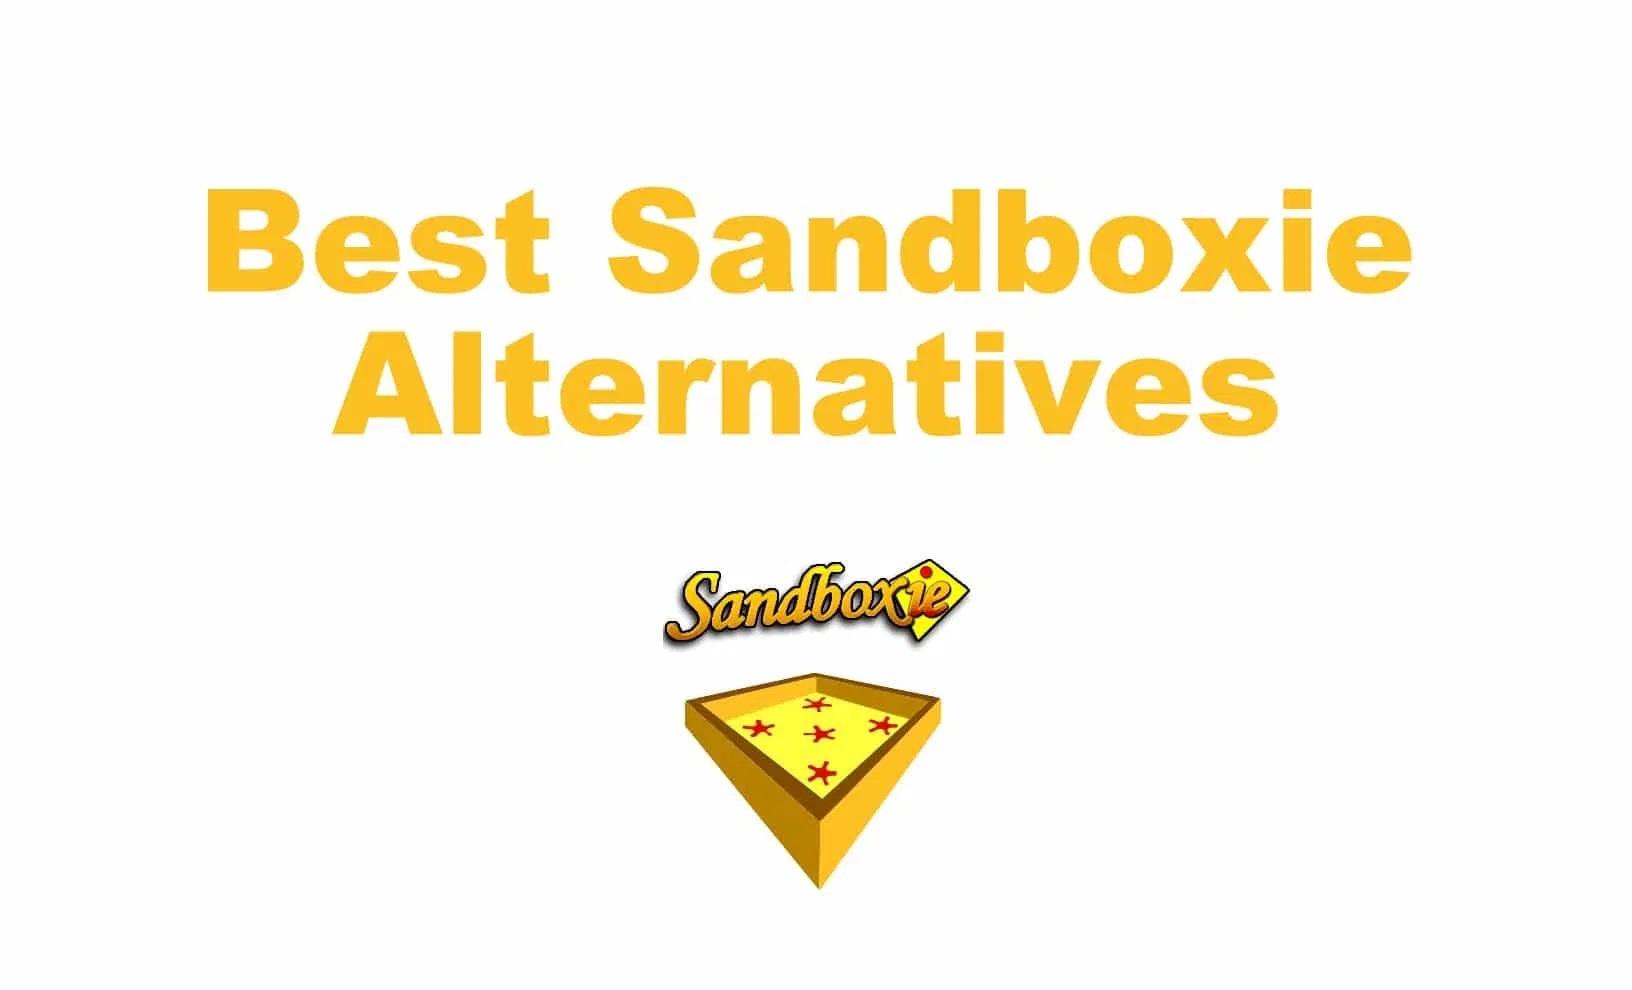 Sandboxie Alternative